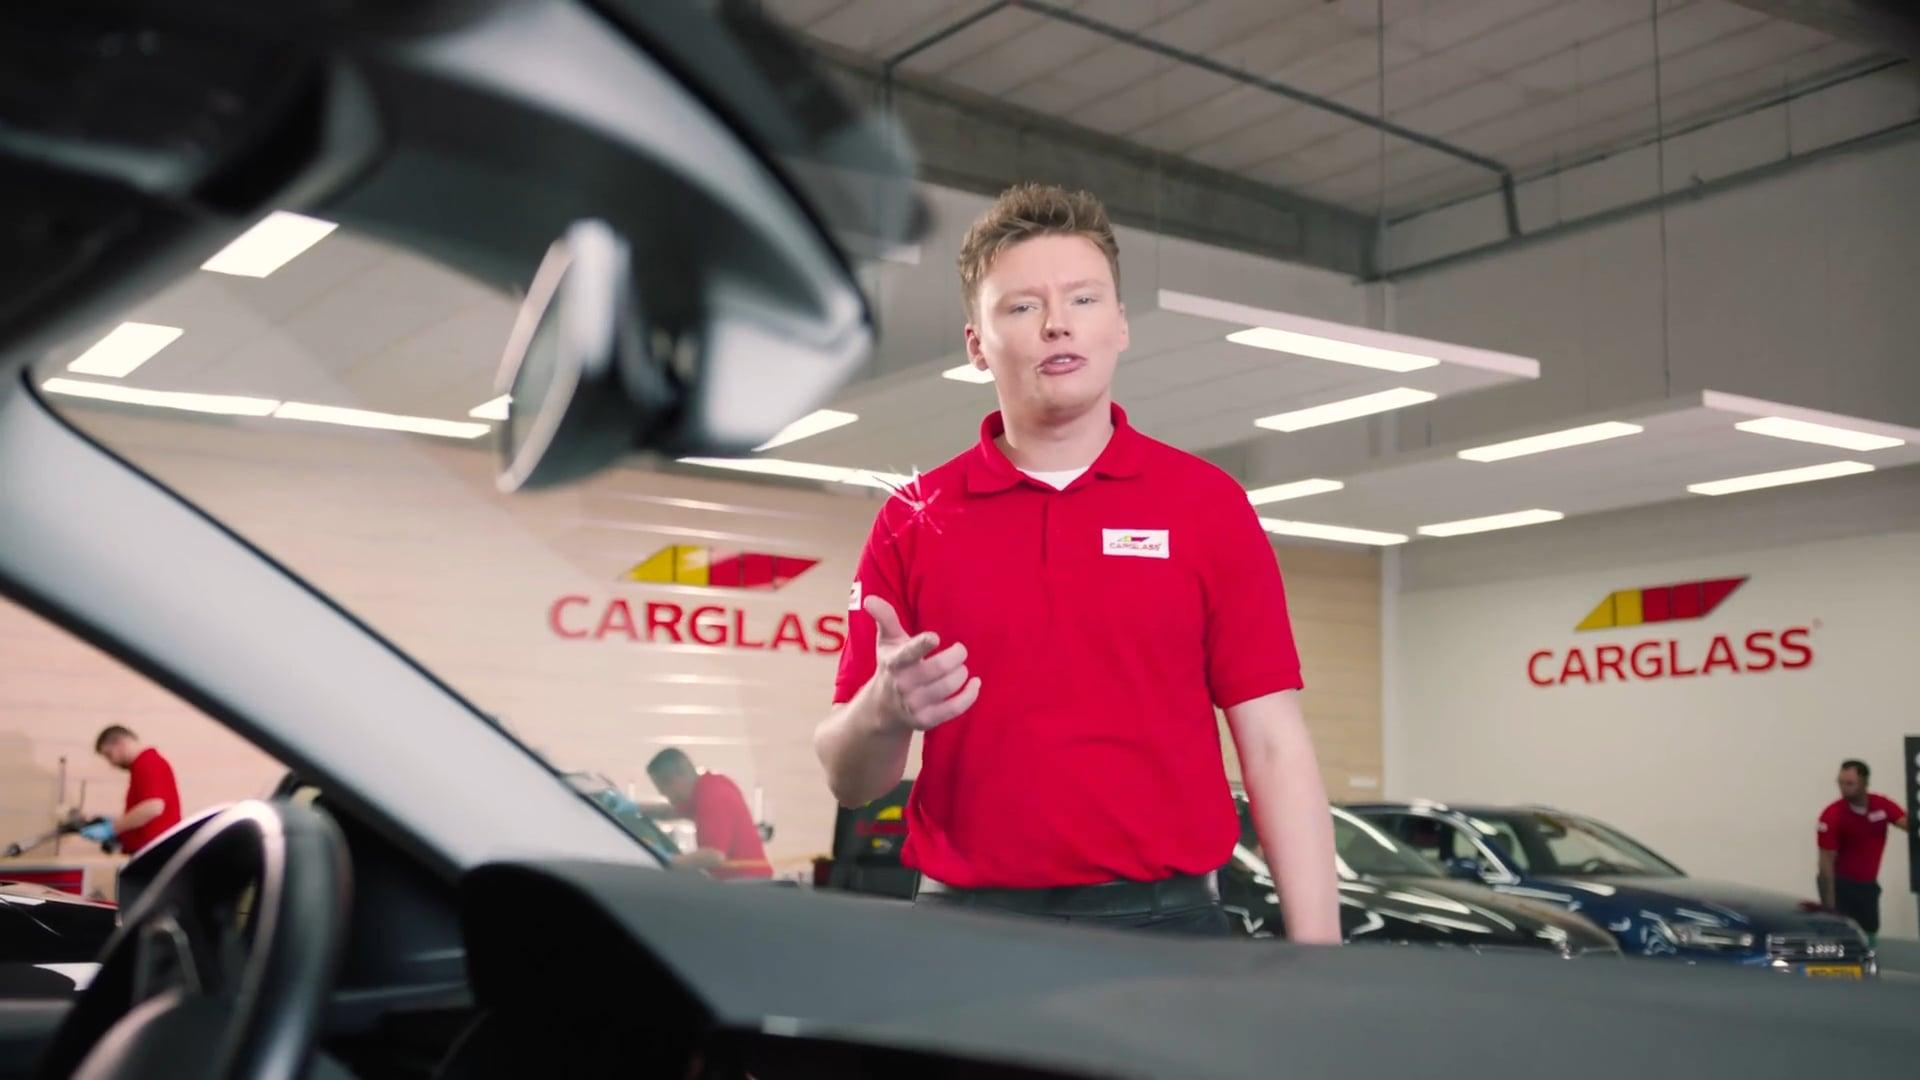 Carglass - Commercials die je kent